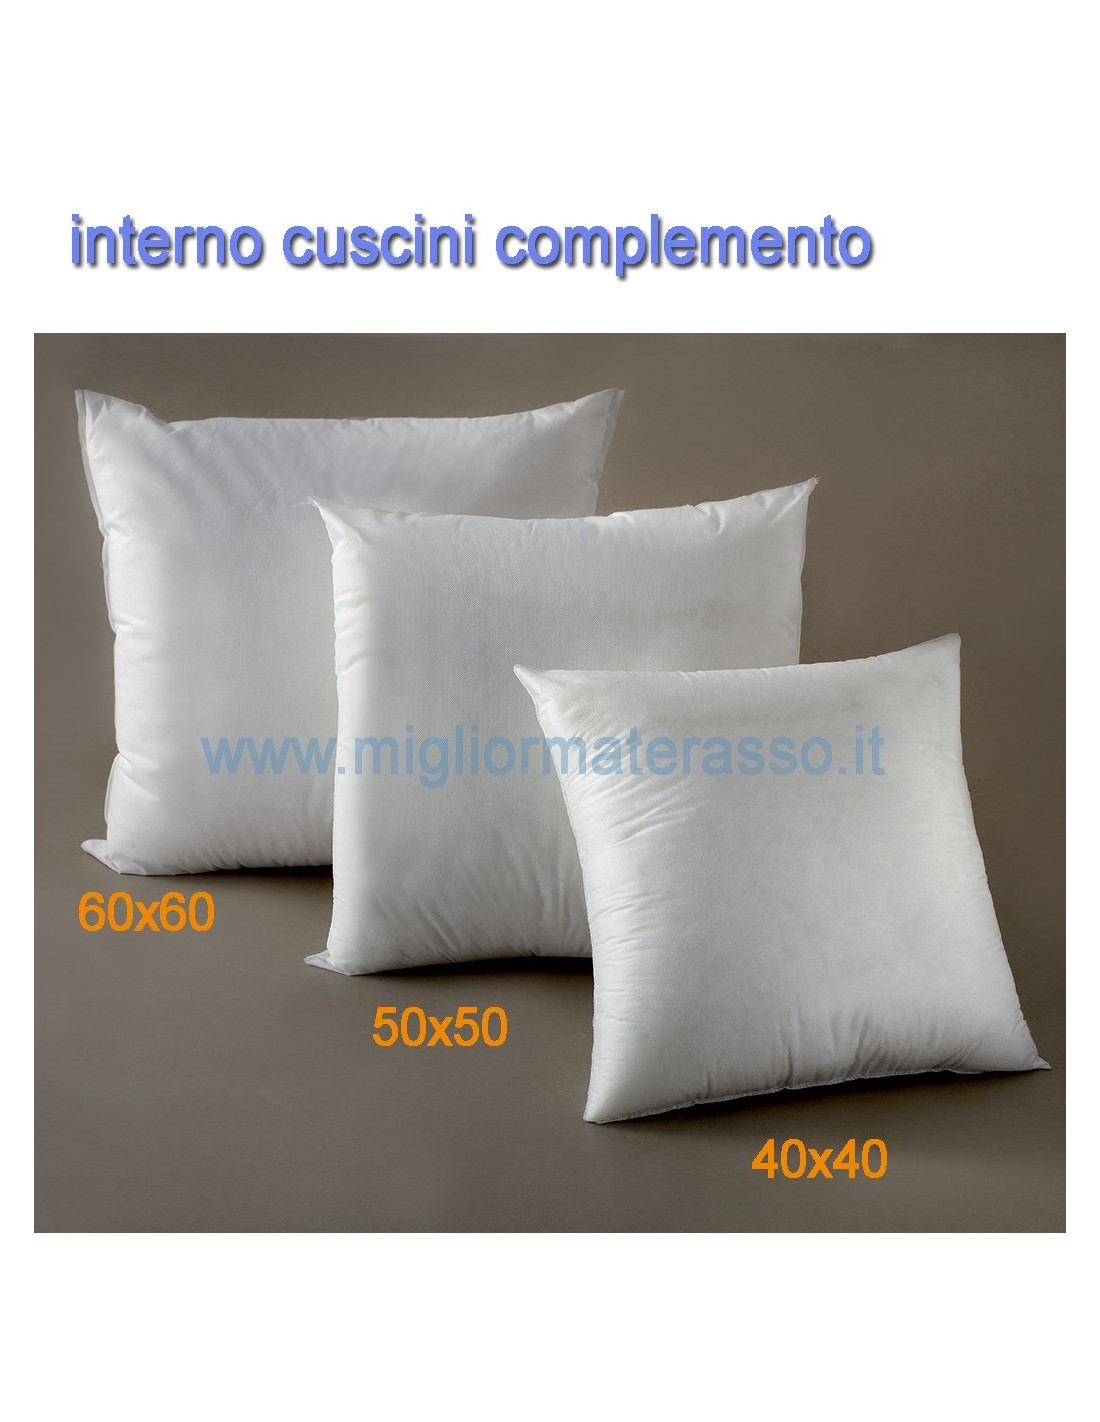 interno per cuscini d 39 arredo 40x40 50x50 60x60 cm varie misure